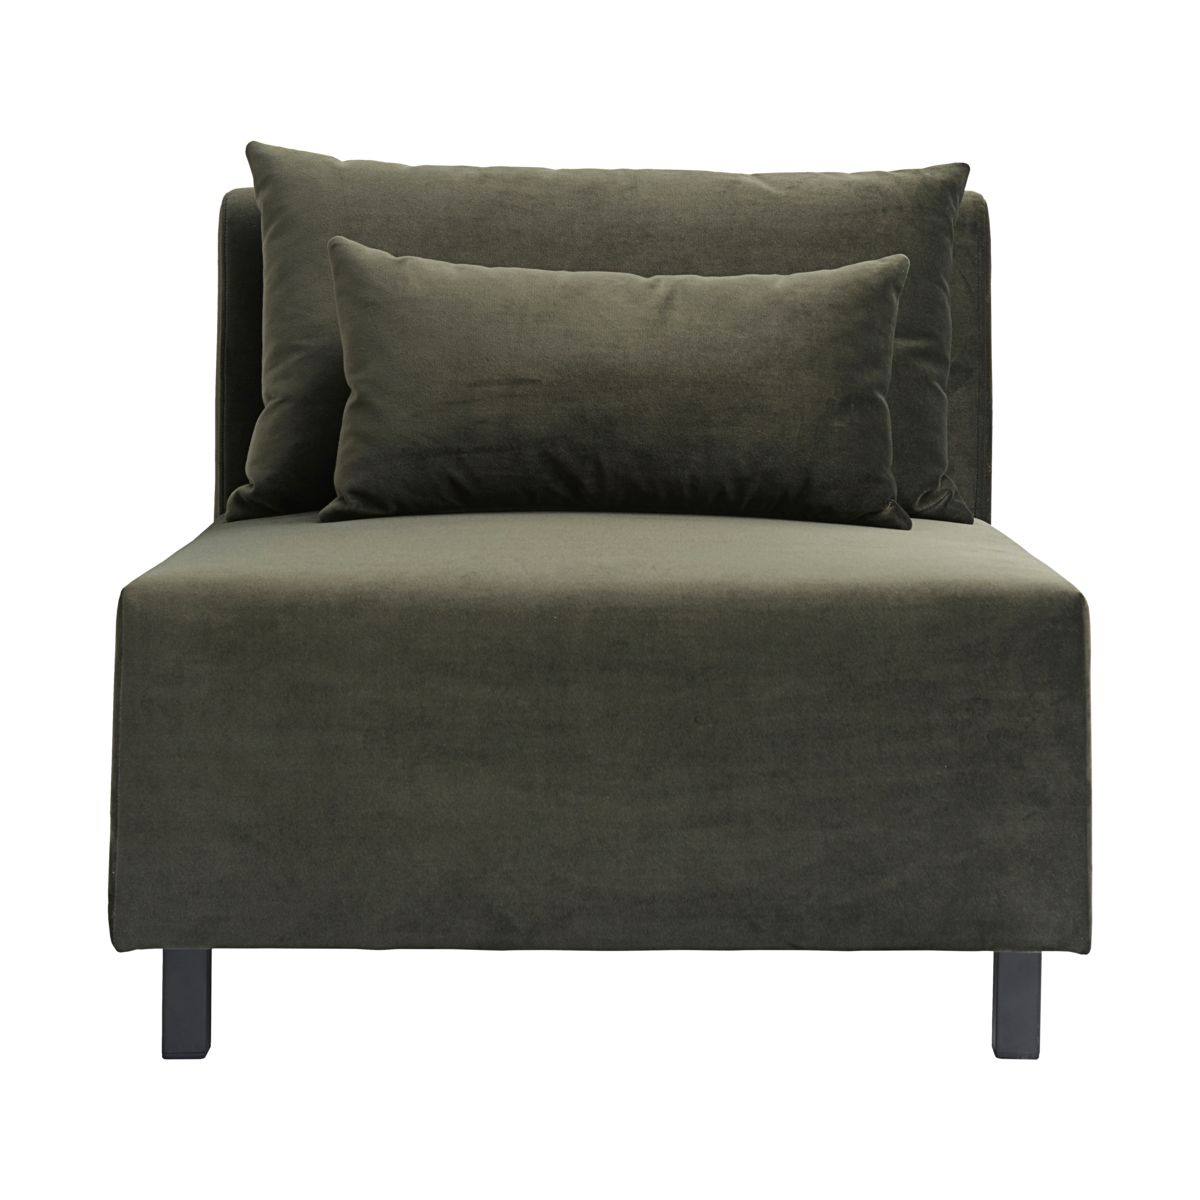 HOUSE DOCTOR sofa modul - mørkegrønt stof m. sorte ben, midterdel (85x85)